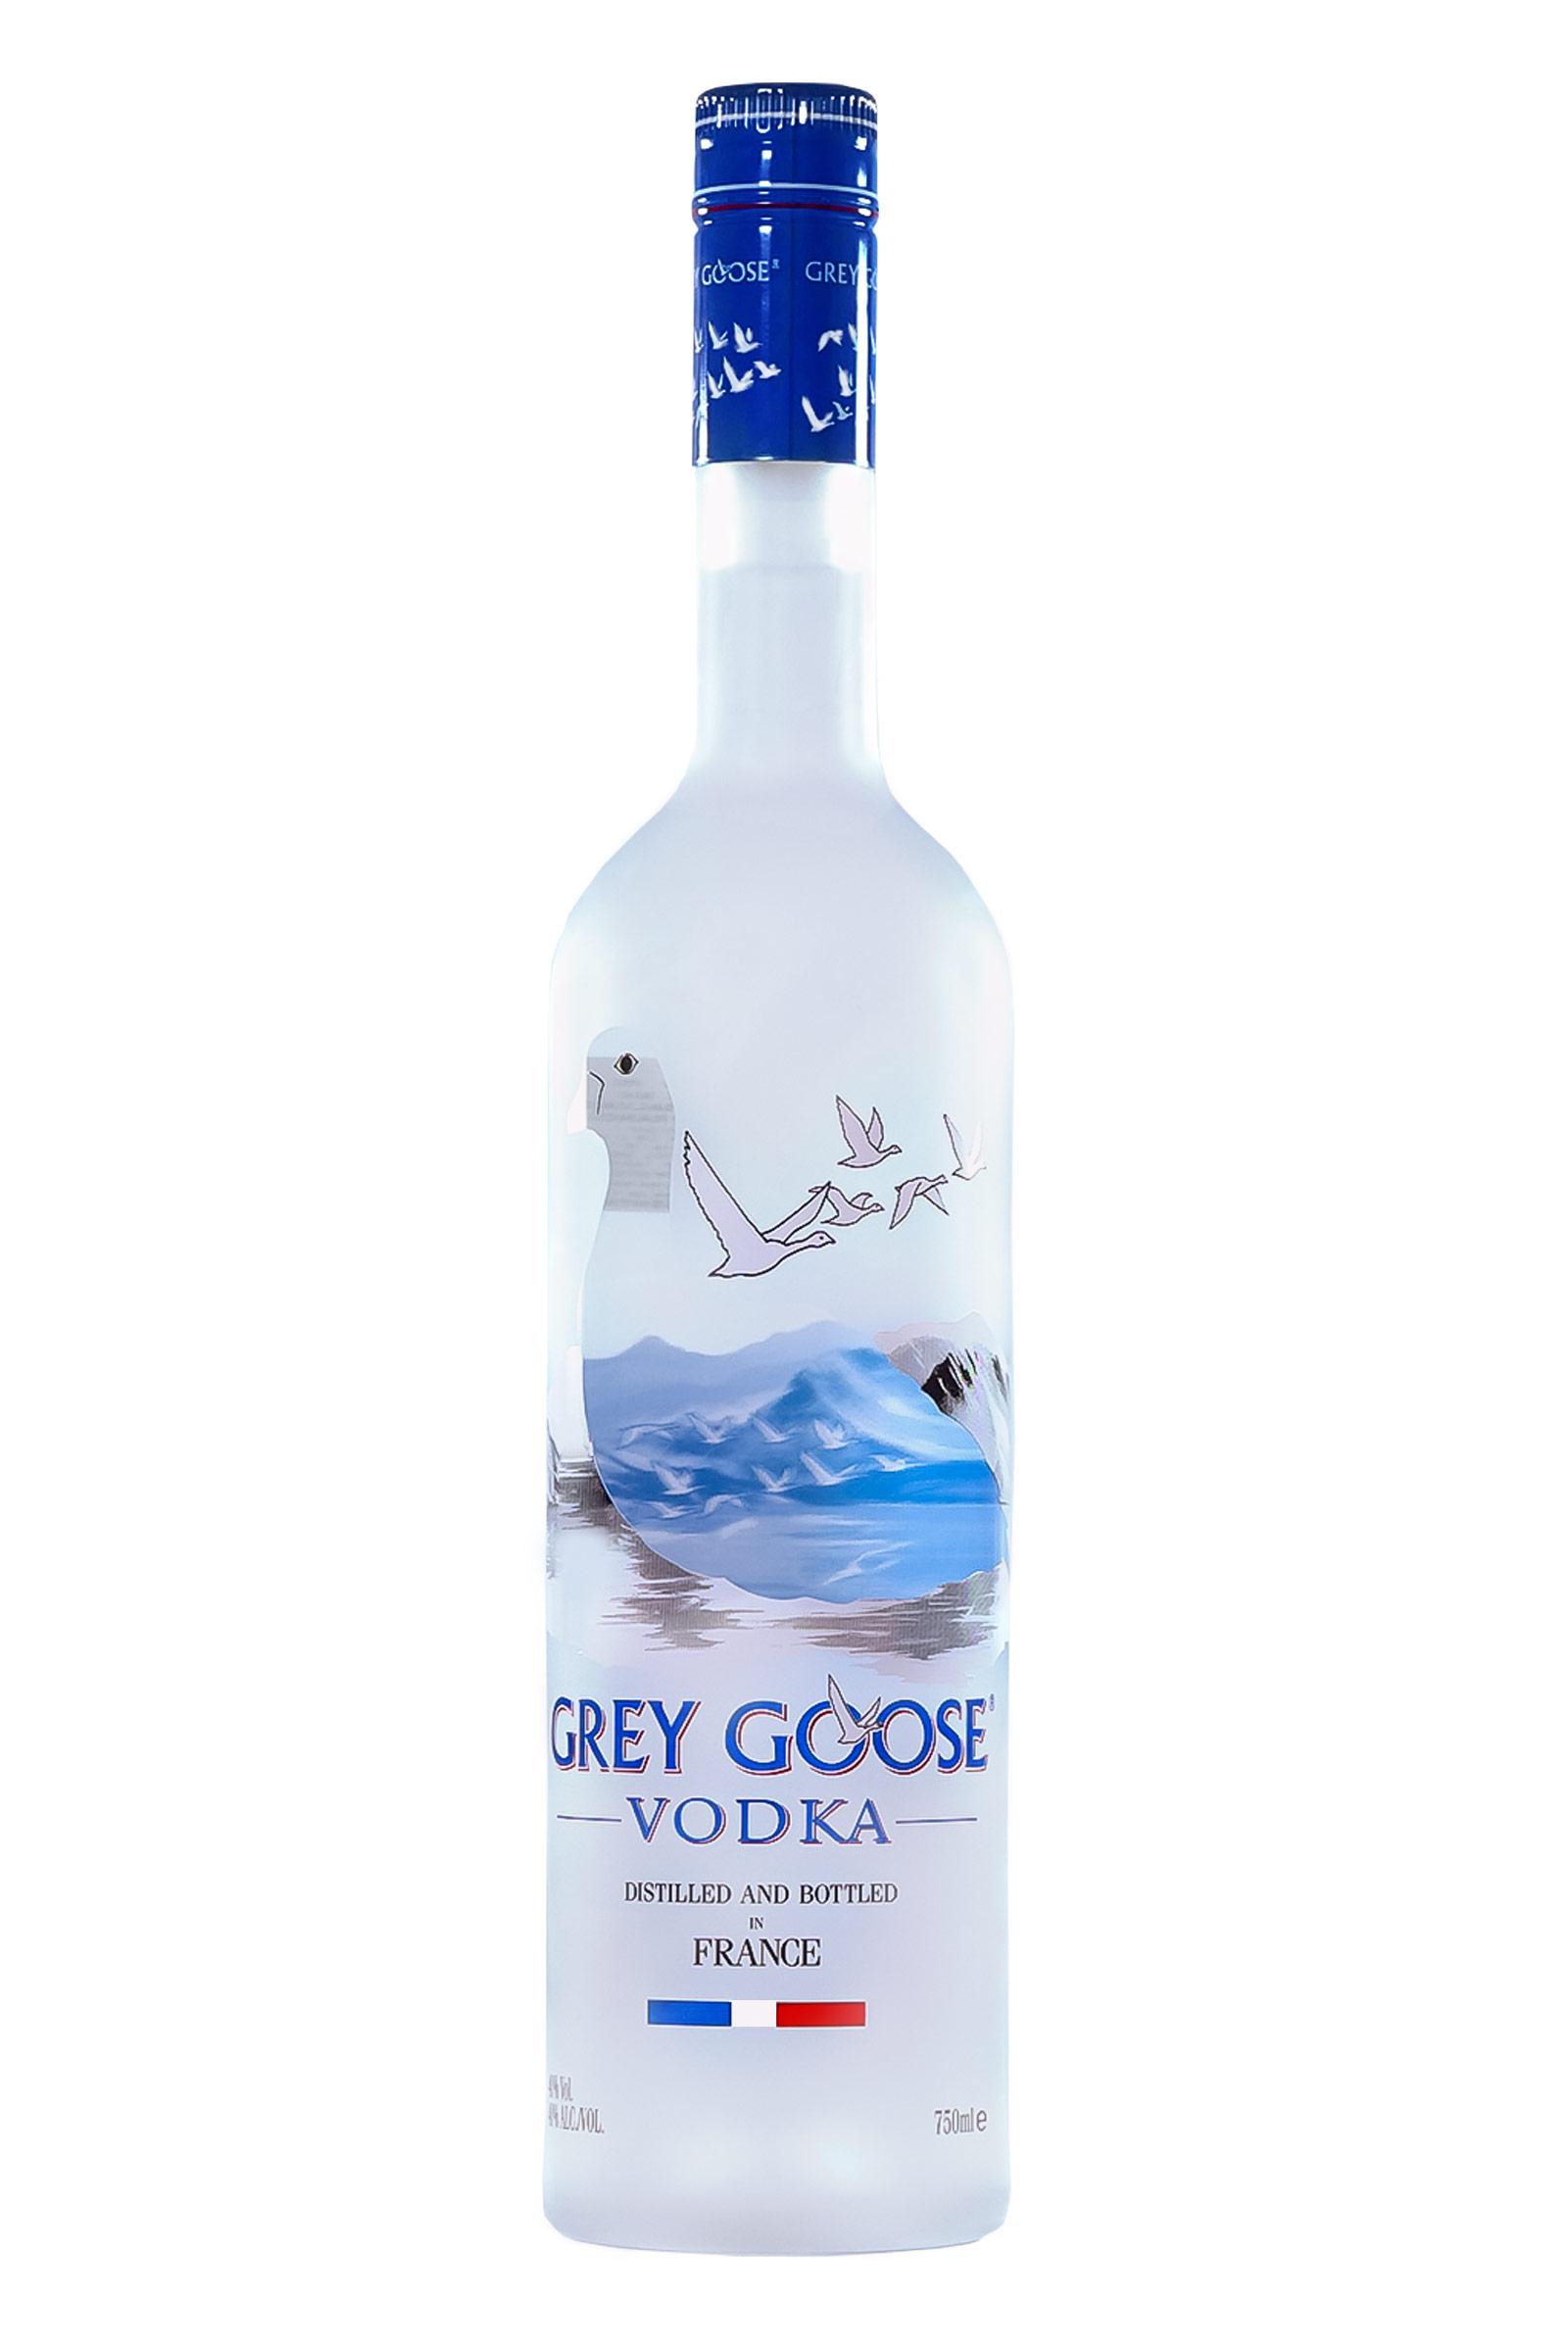 Vodka Grey Goose 750ml